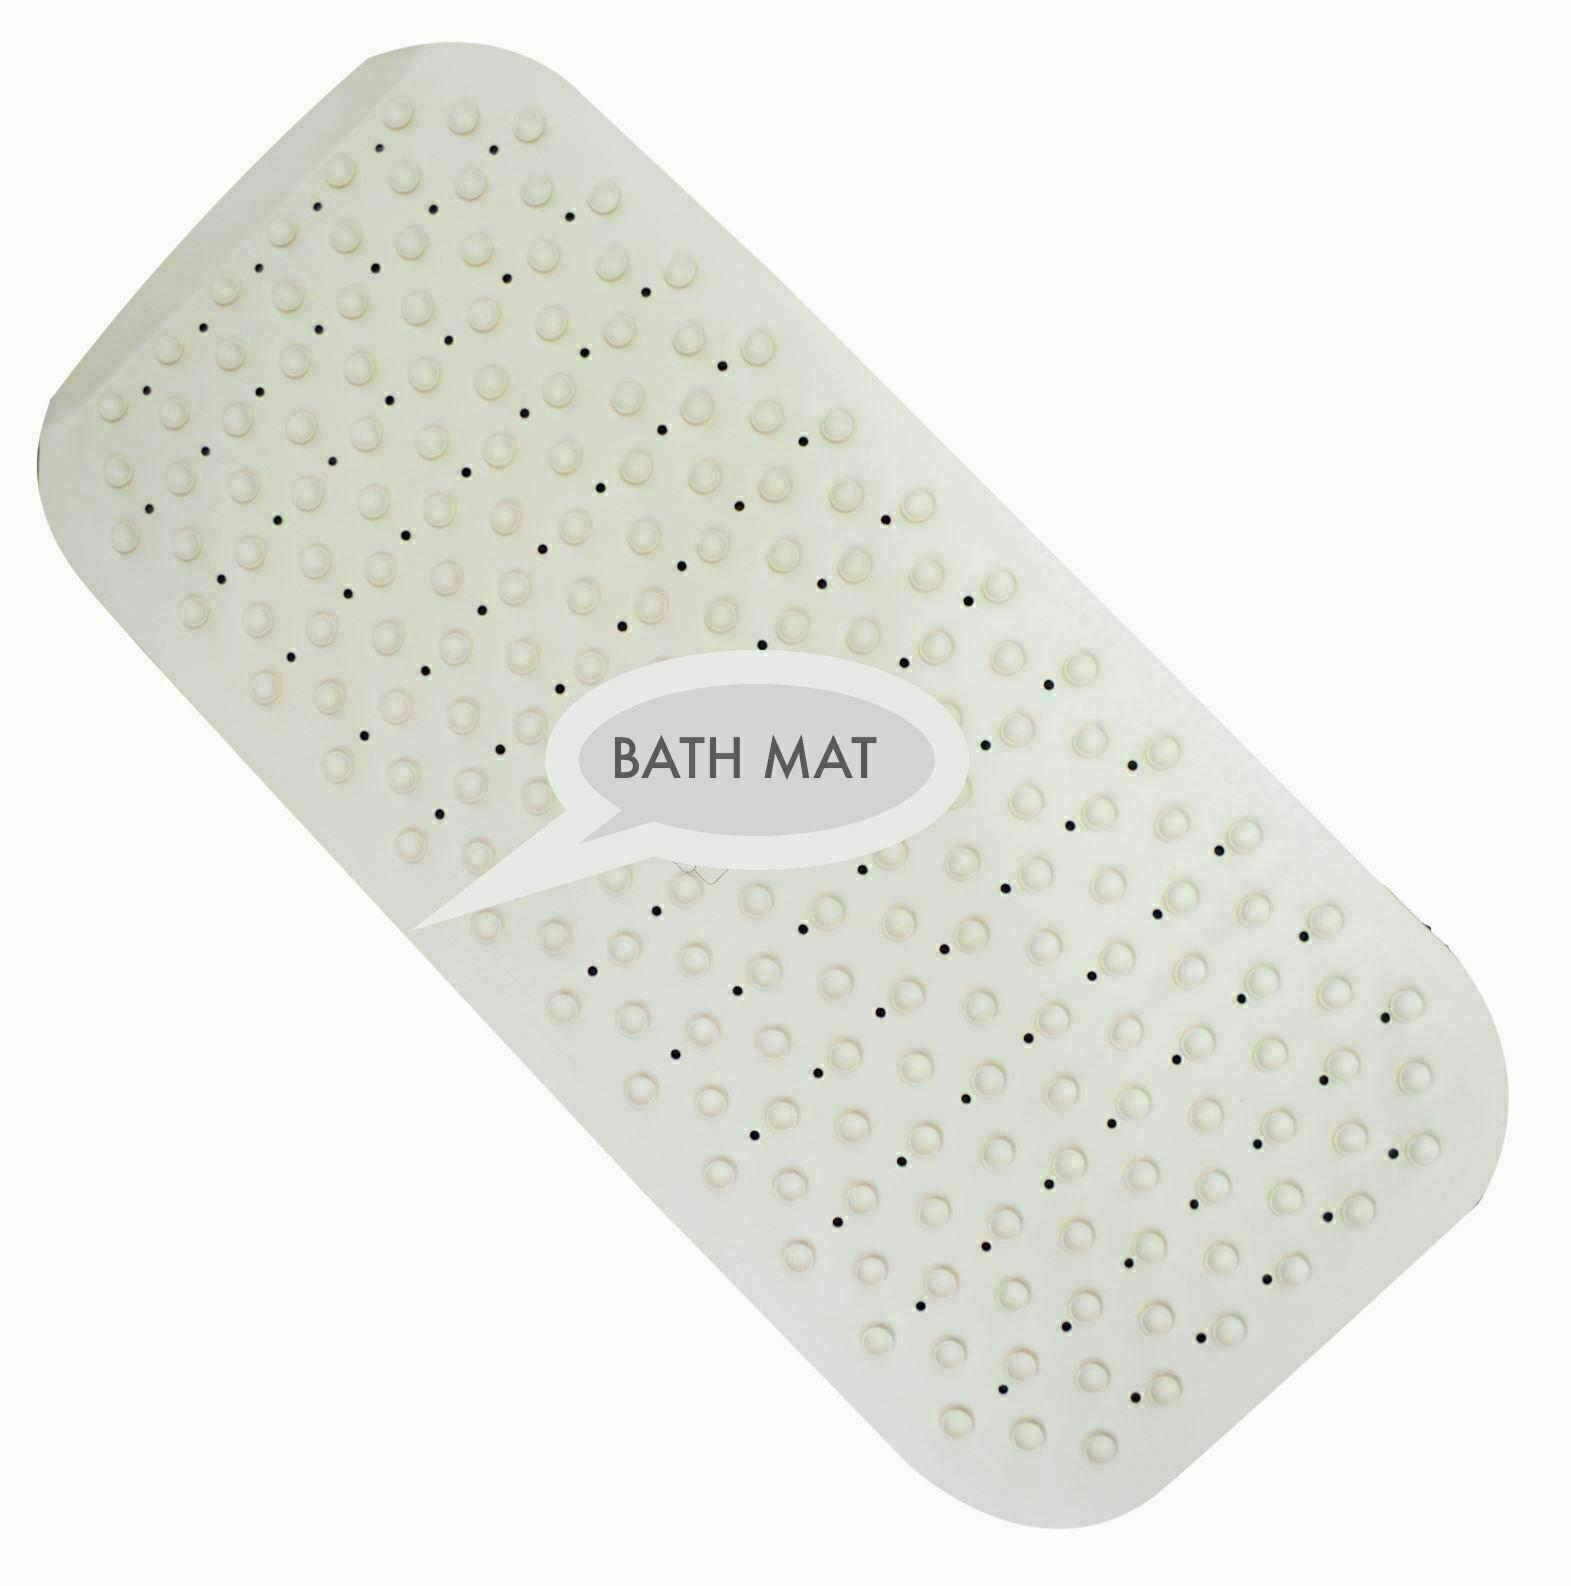 Extra Long Soft Rubber Grip Strong Suction Non-Slip Anti All Bath Shower Mat UK